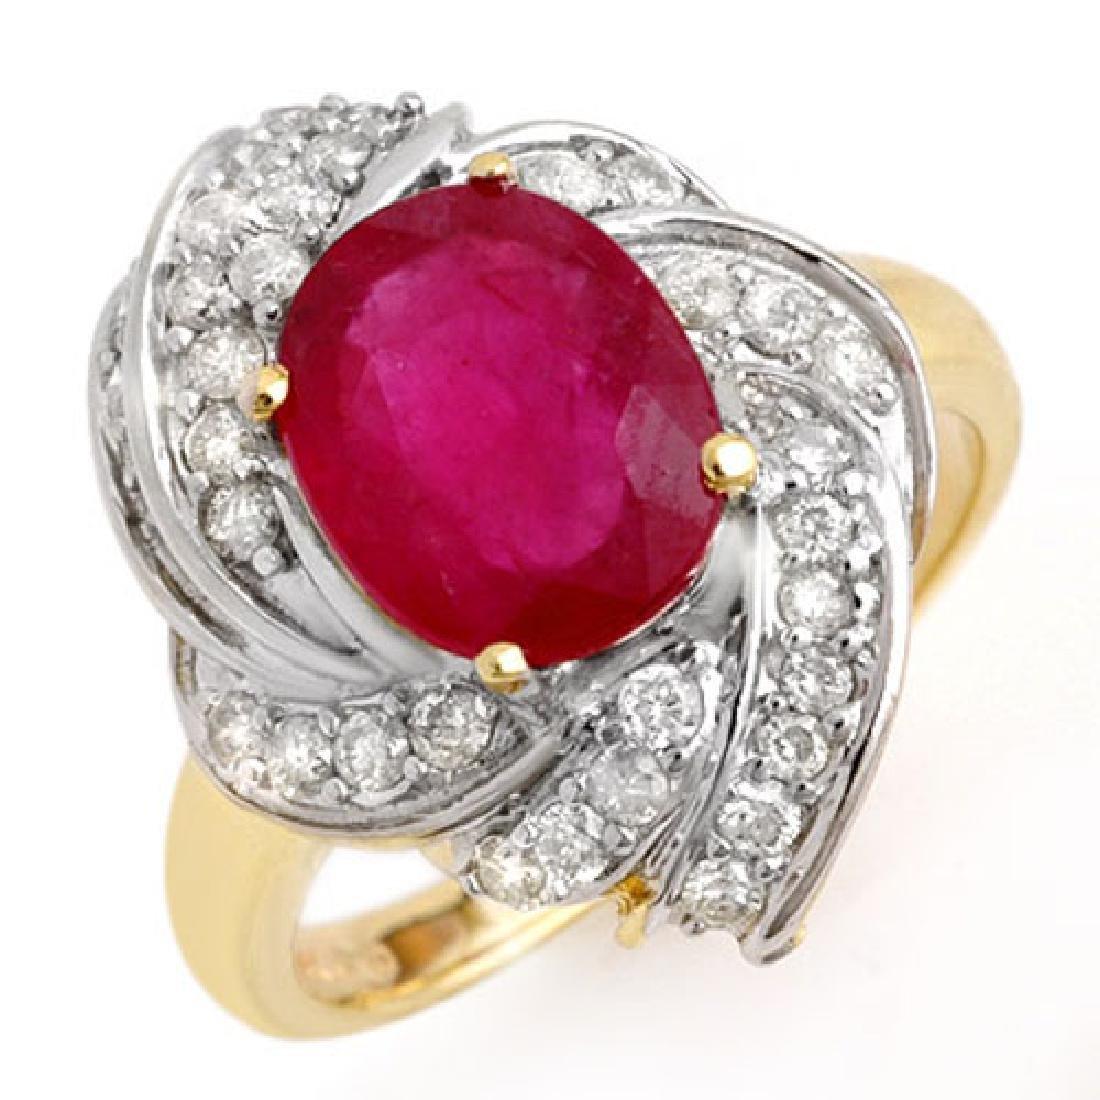 3.55 CTW Ruby & Diamond Ring 14K Yellow Gold